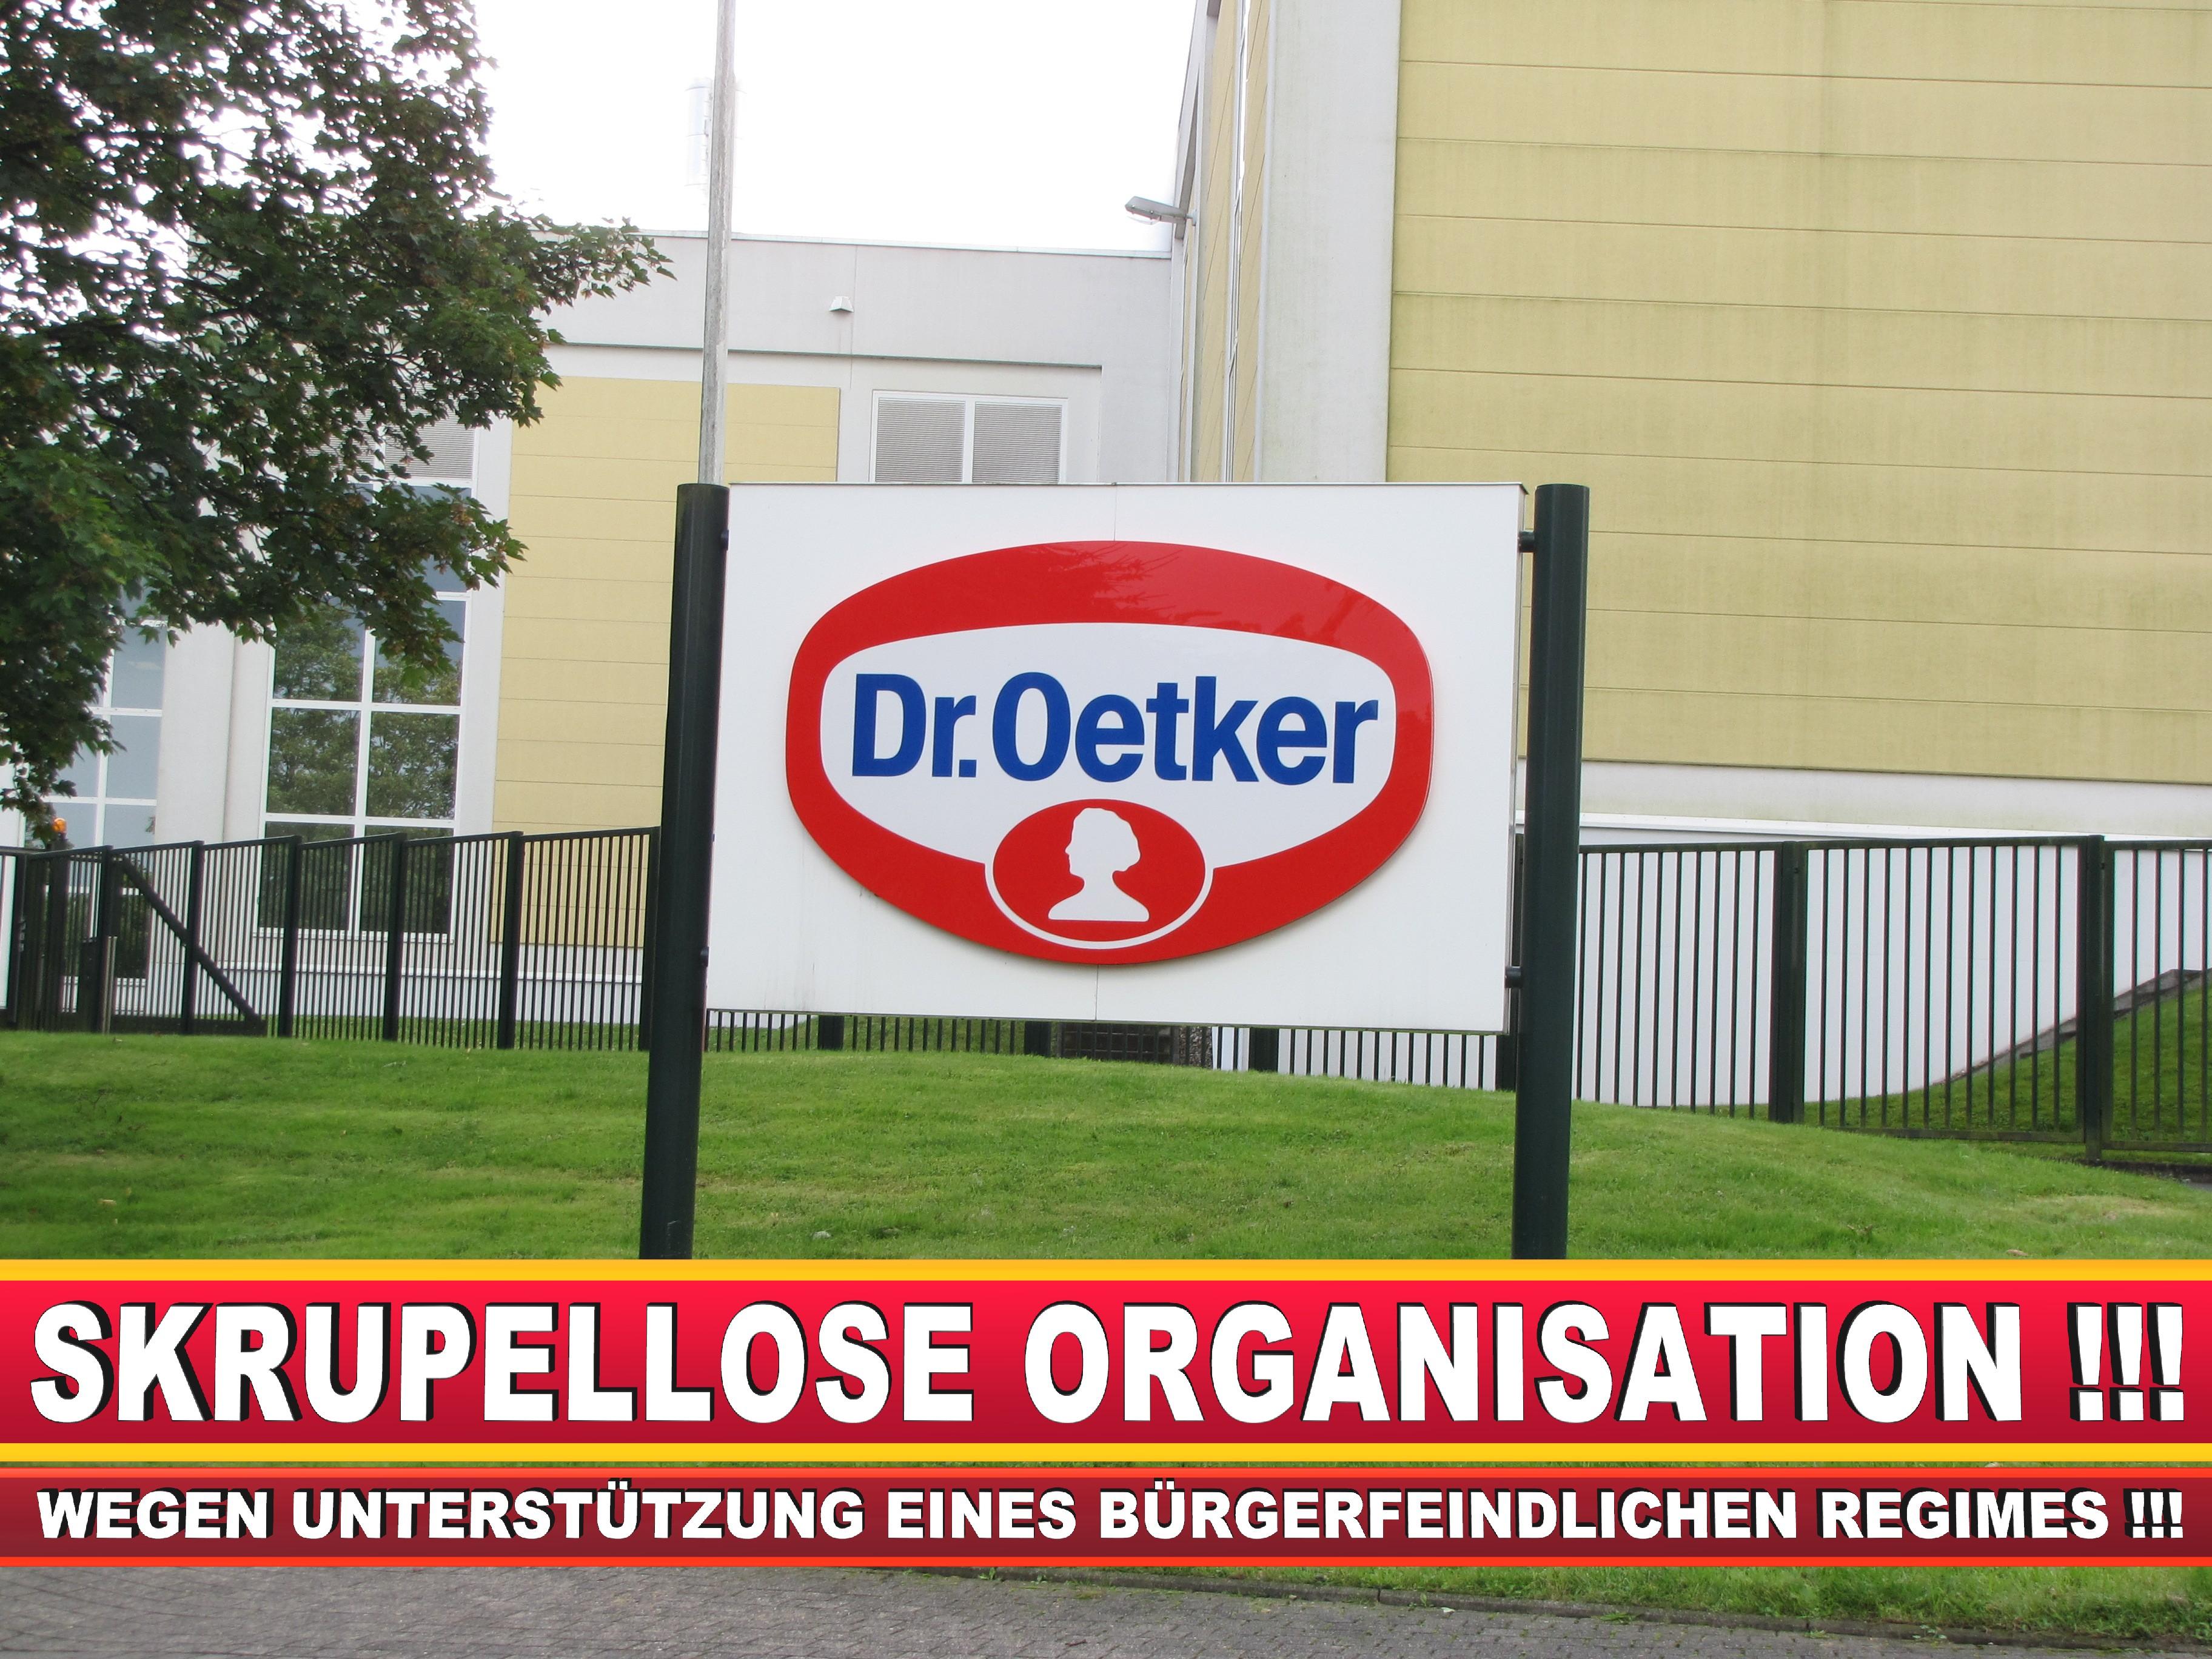 Dr Oetker Bielefeld CDU Bielefeld Spendengelder Skandal Richard August (42)